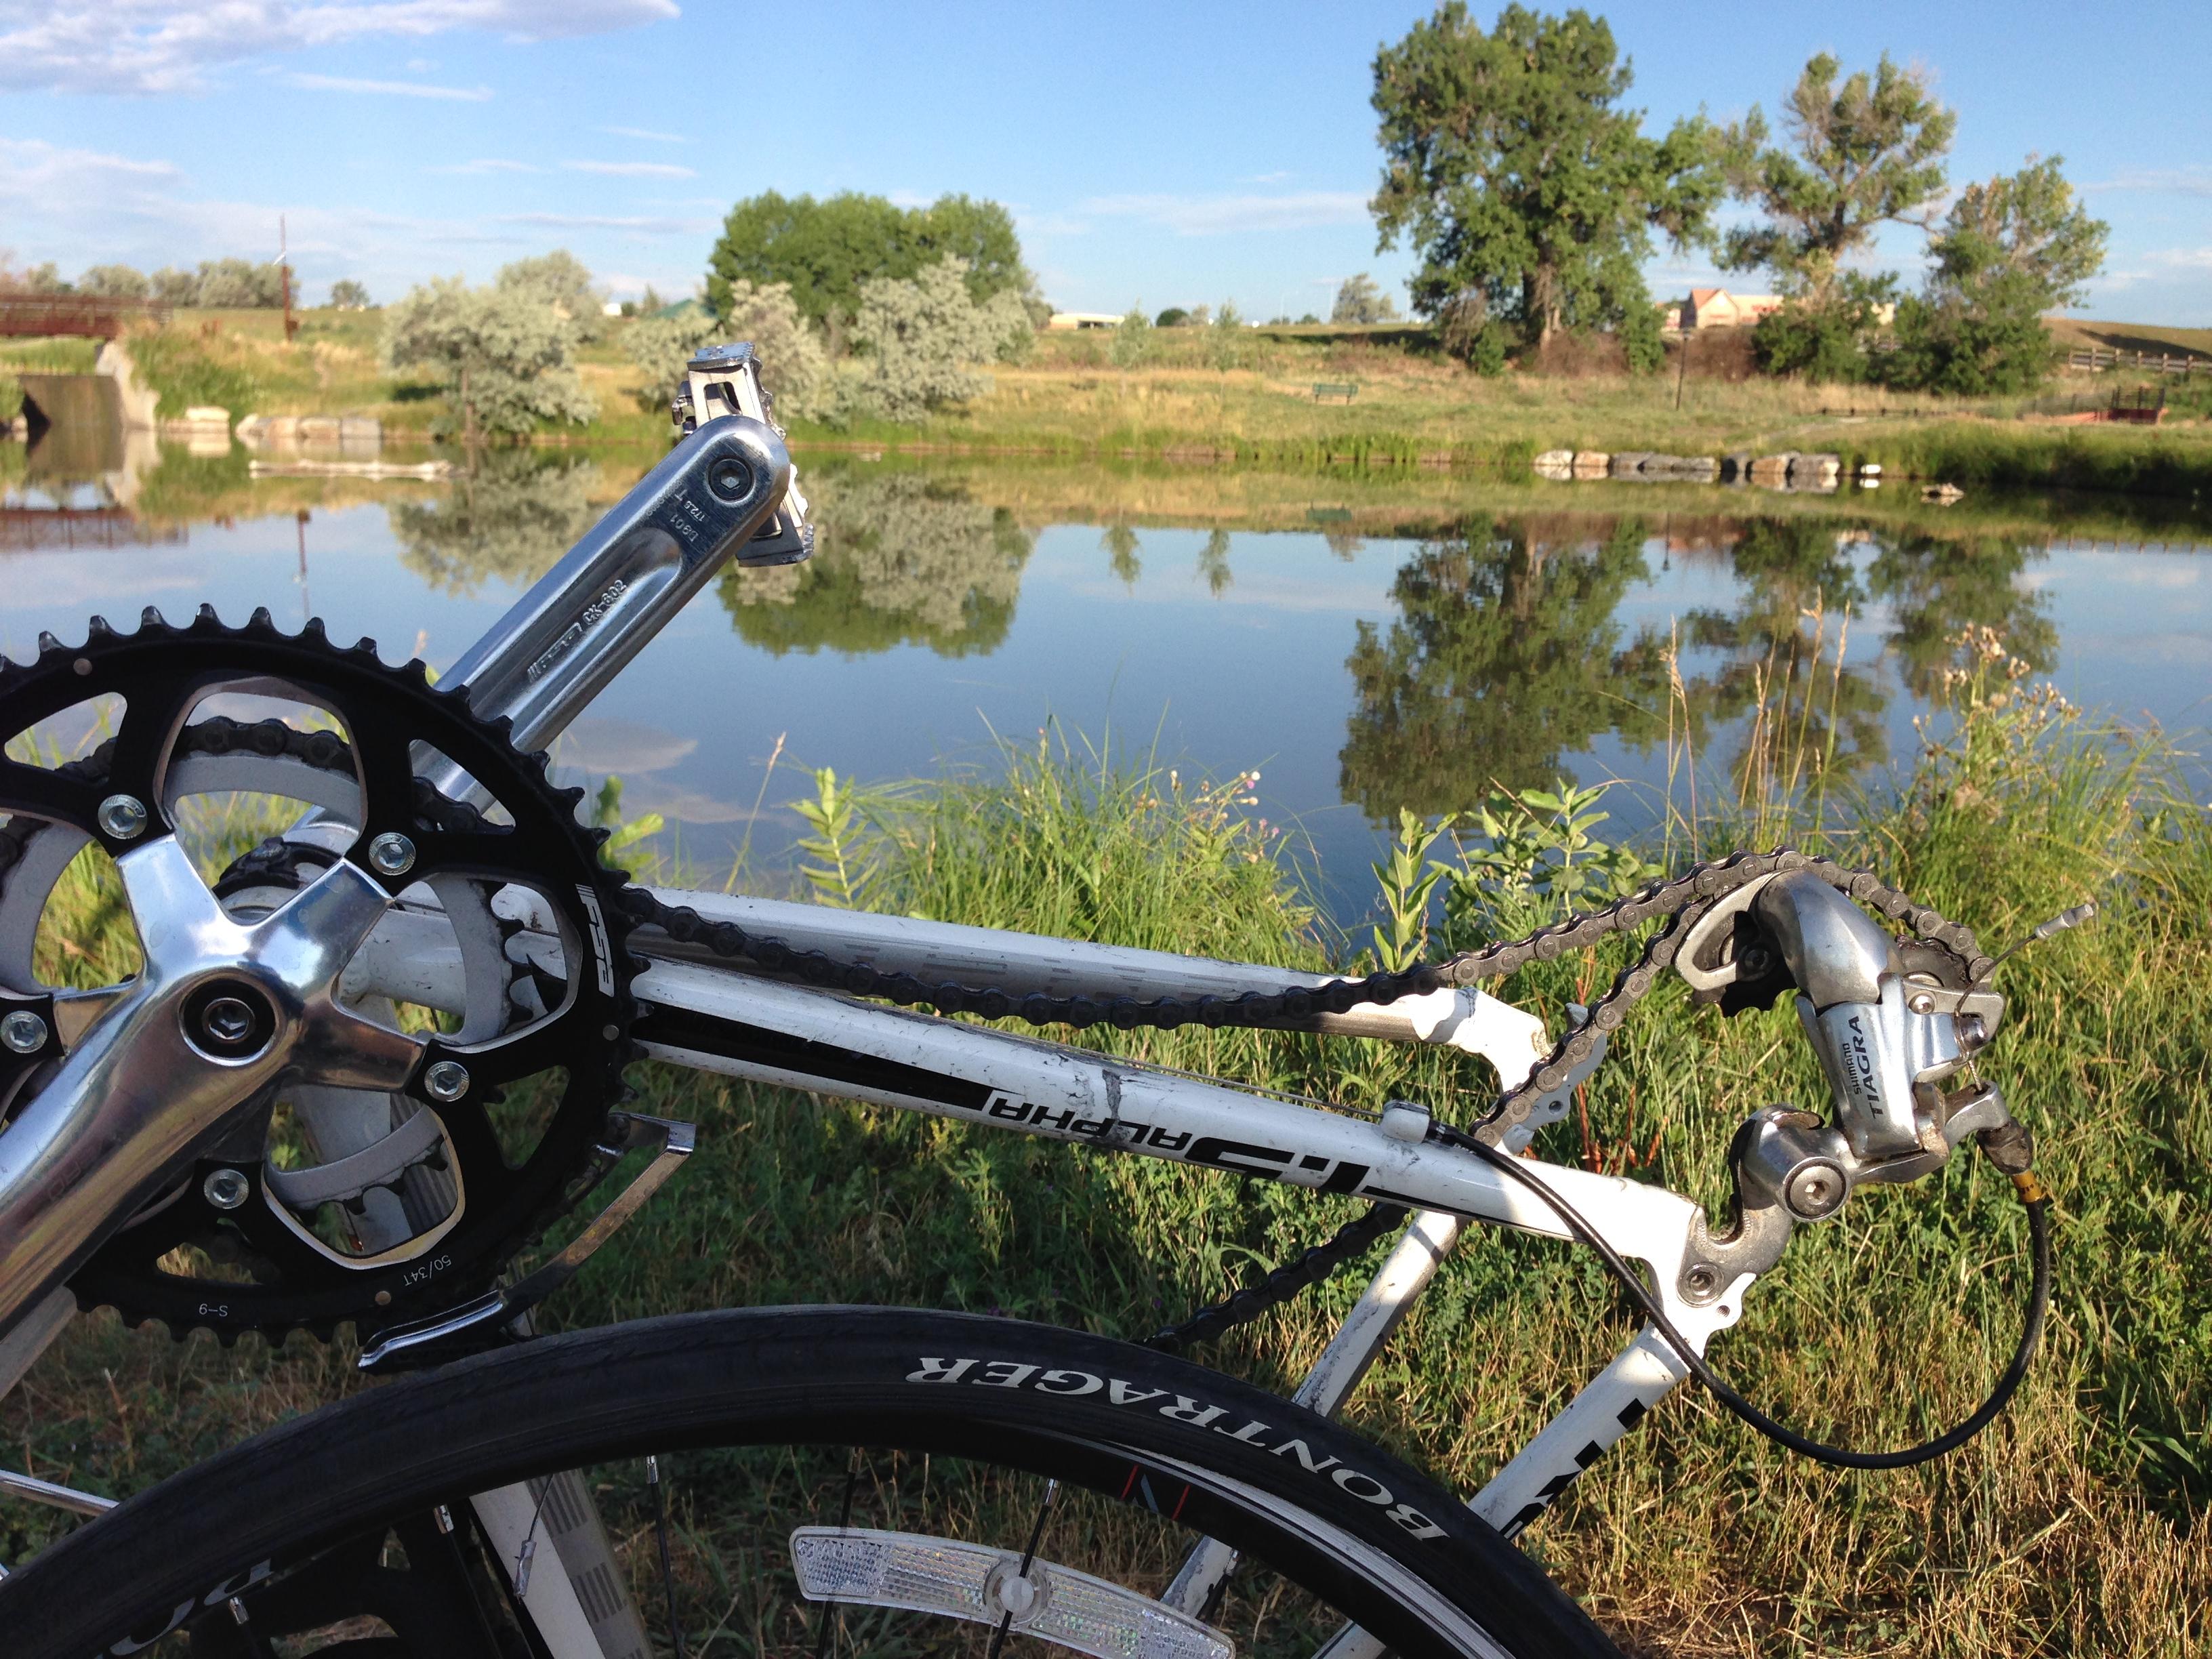 Bike Flat at the Park